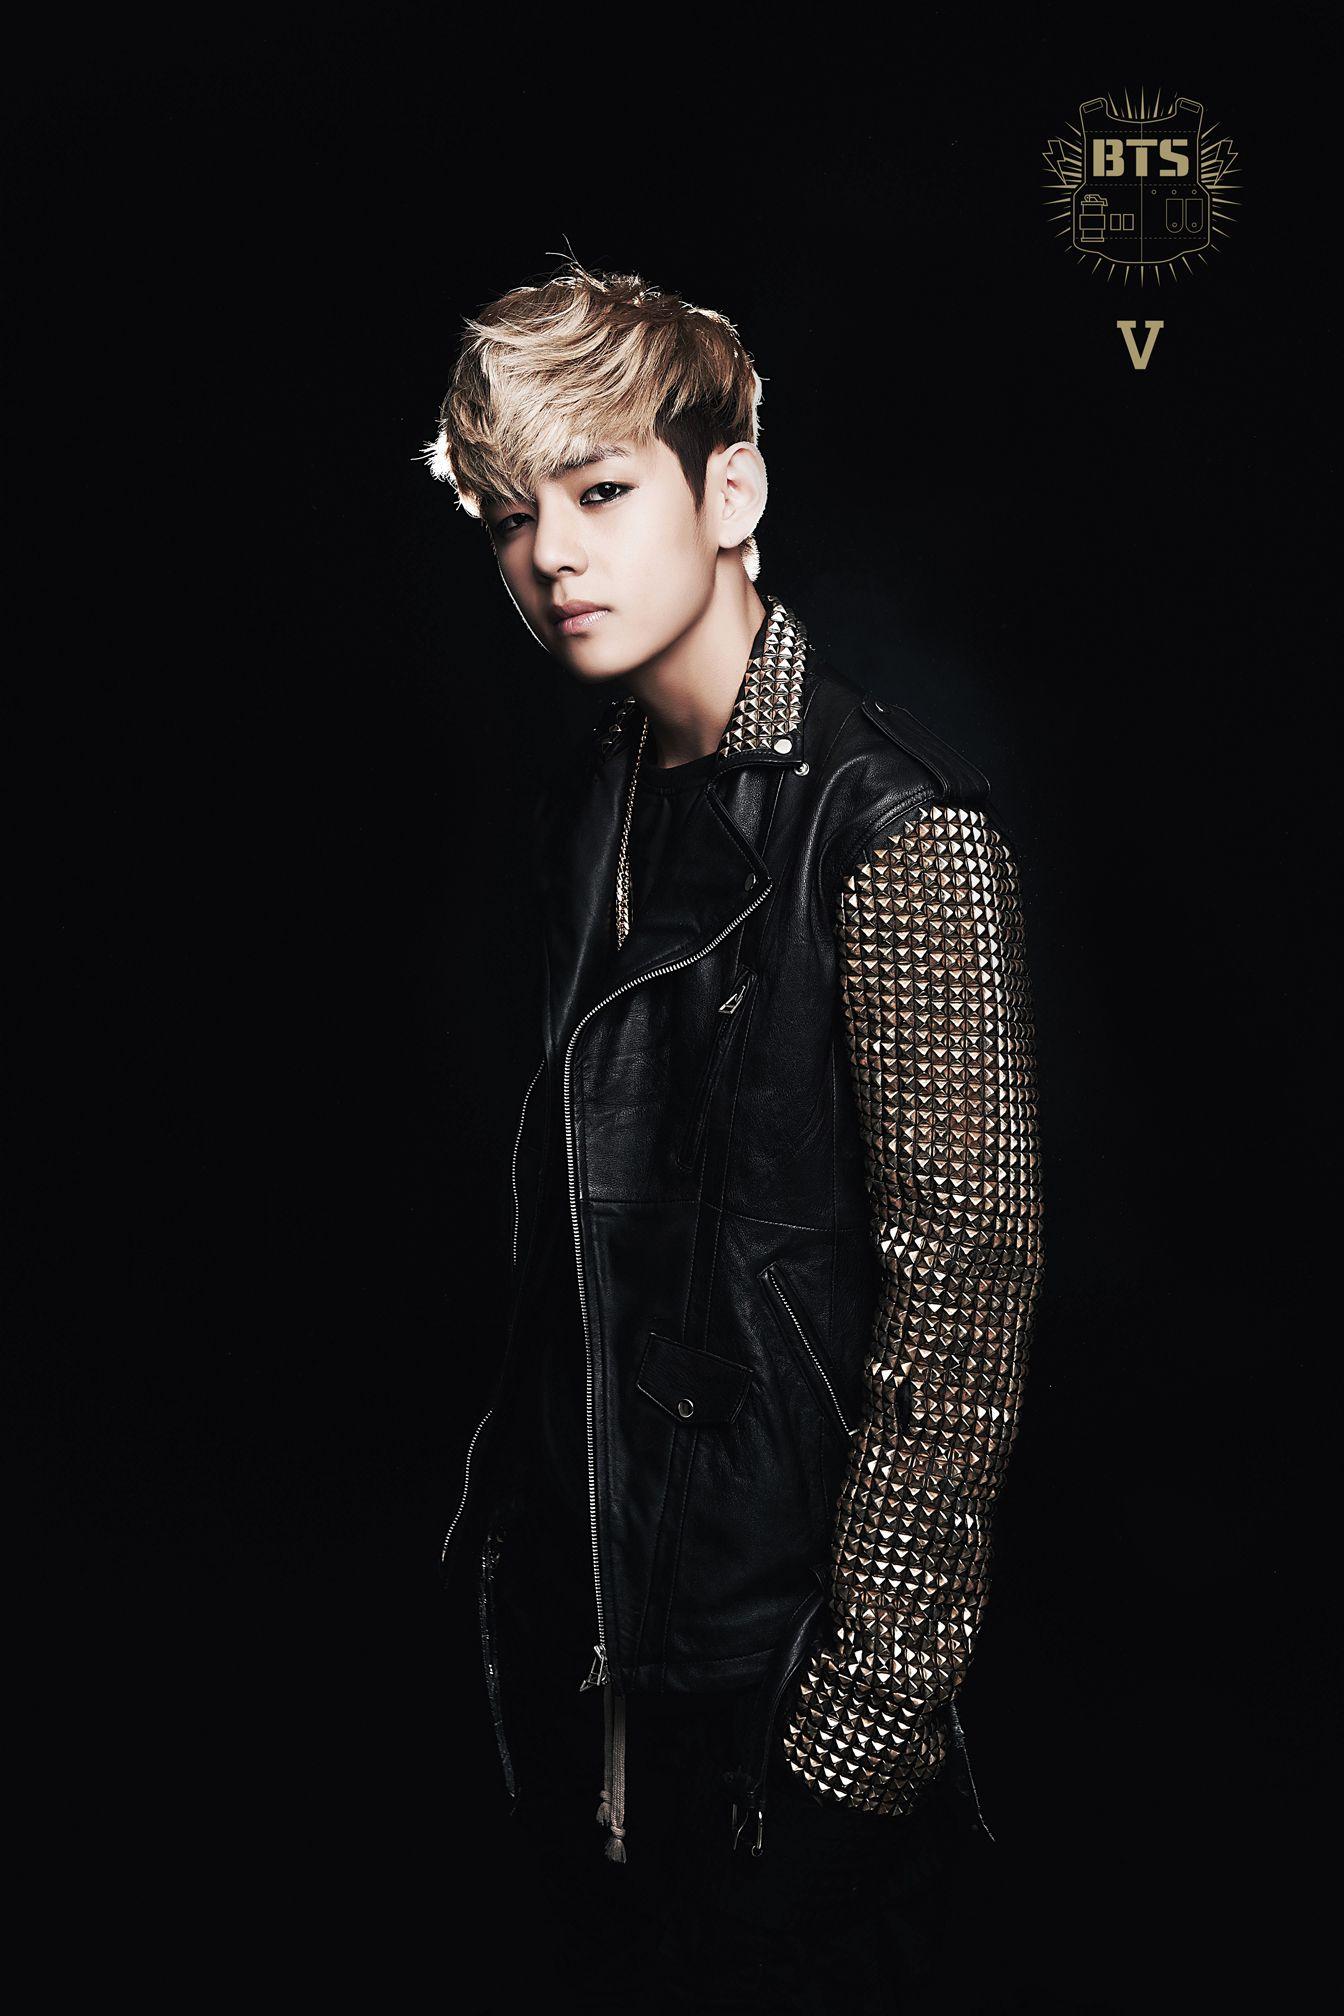 Bts Vvvvvvvvv Selebritas Taehyung Entertainment